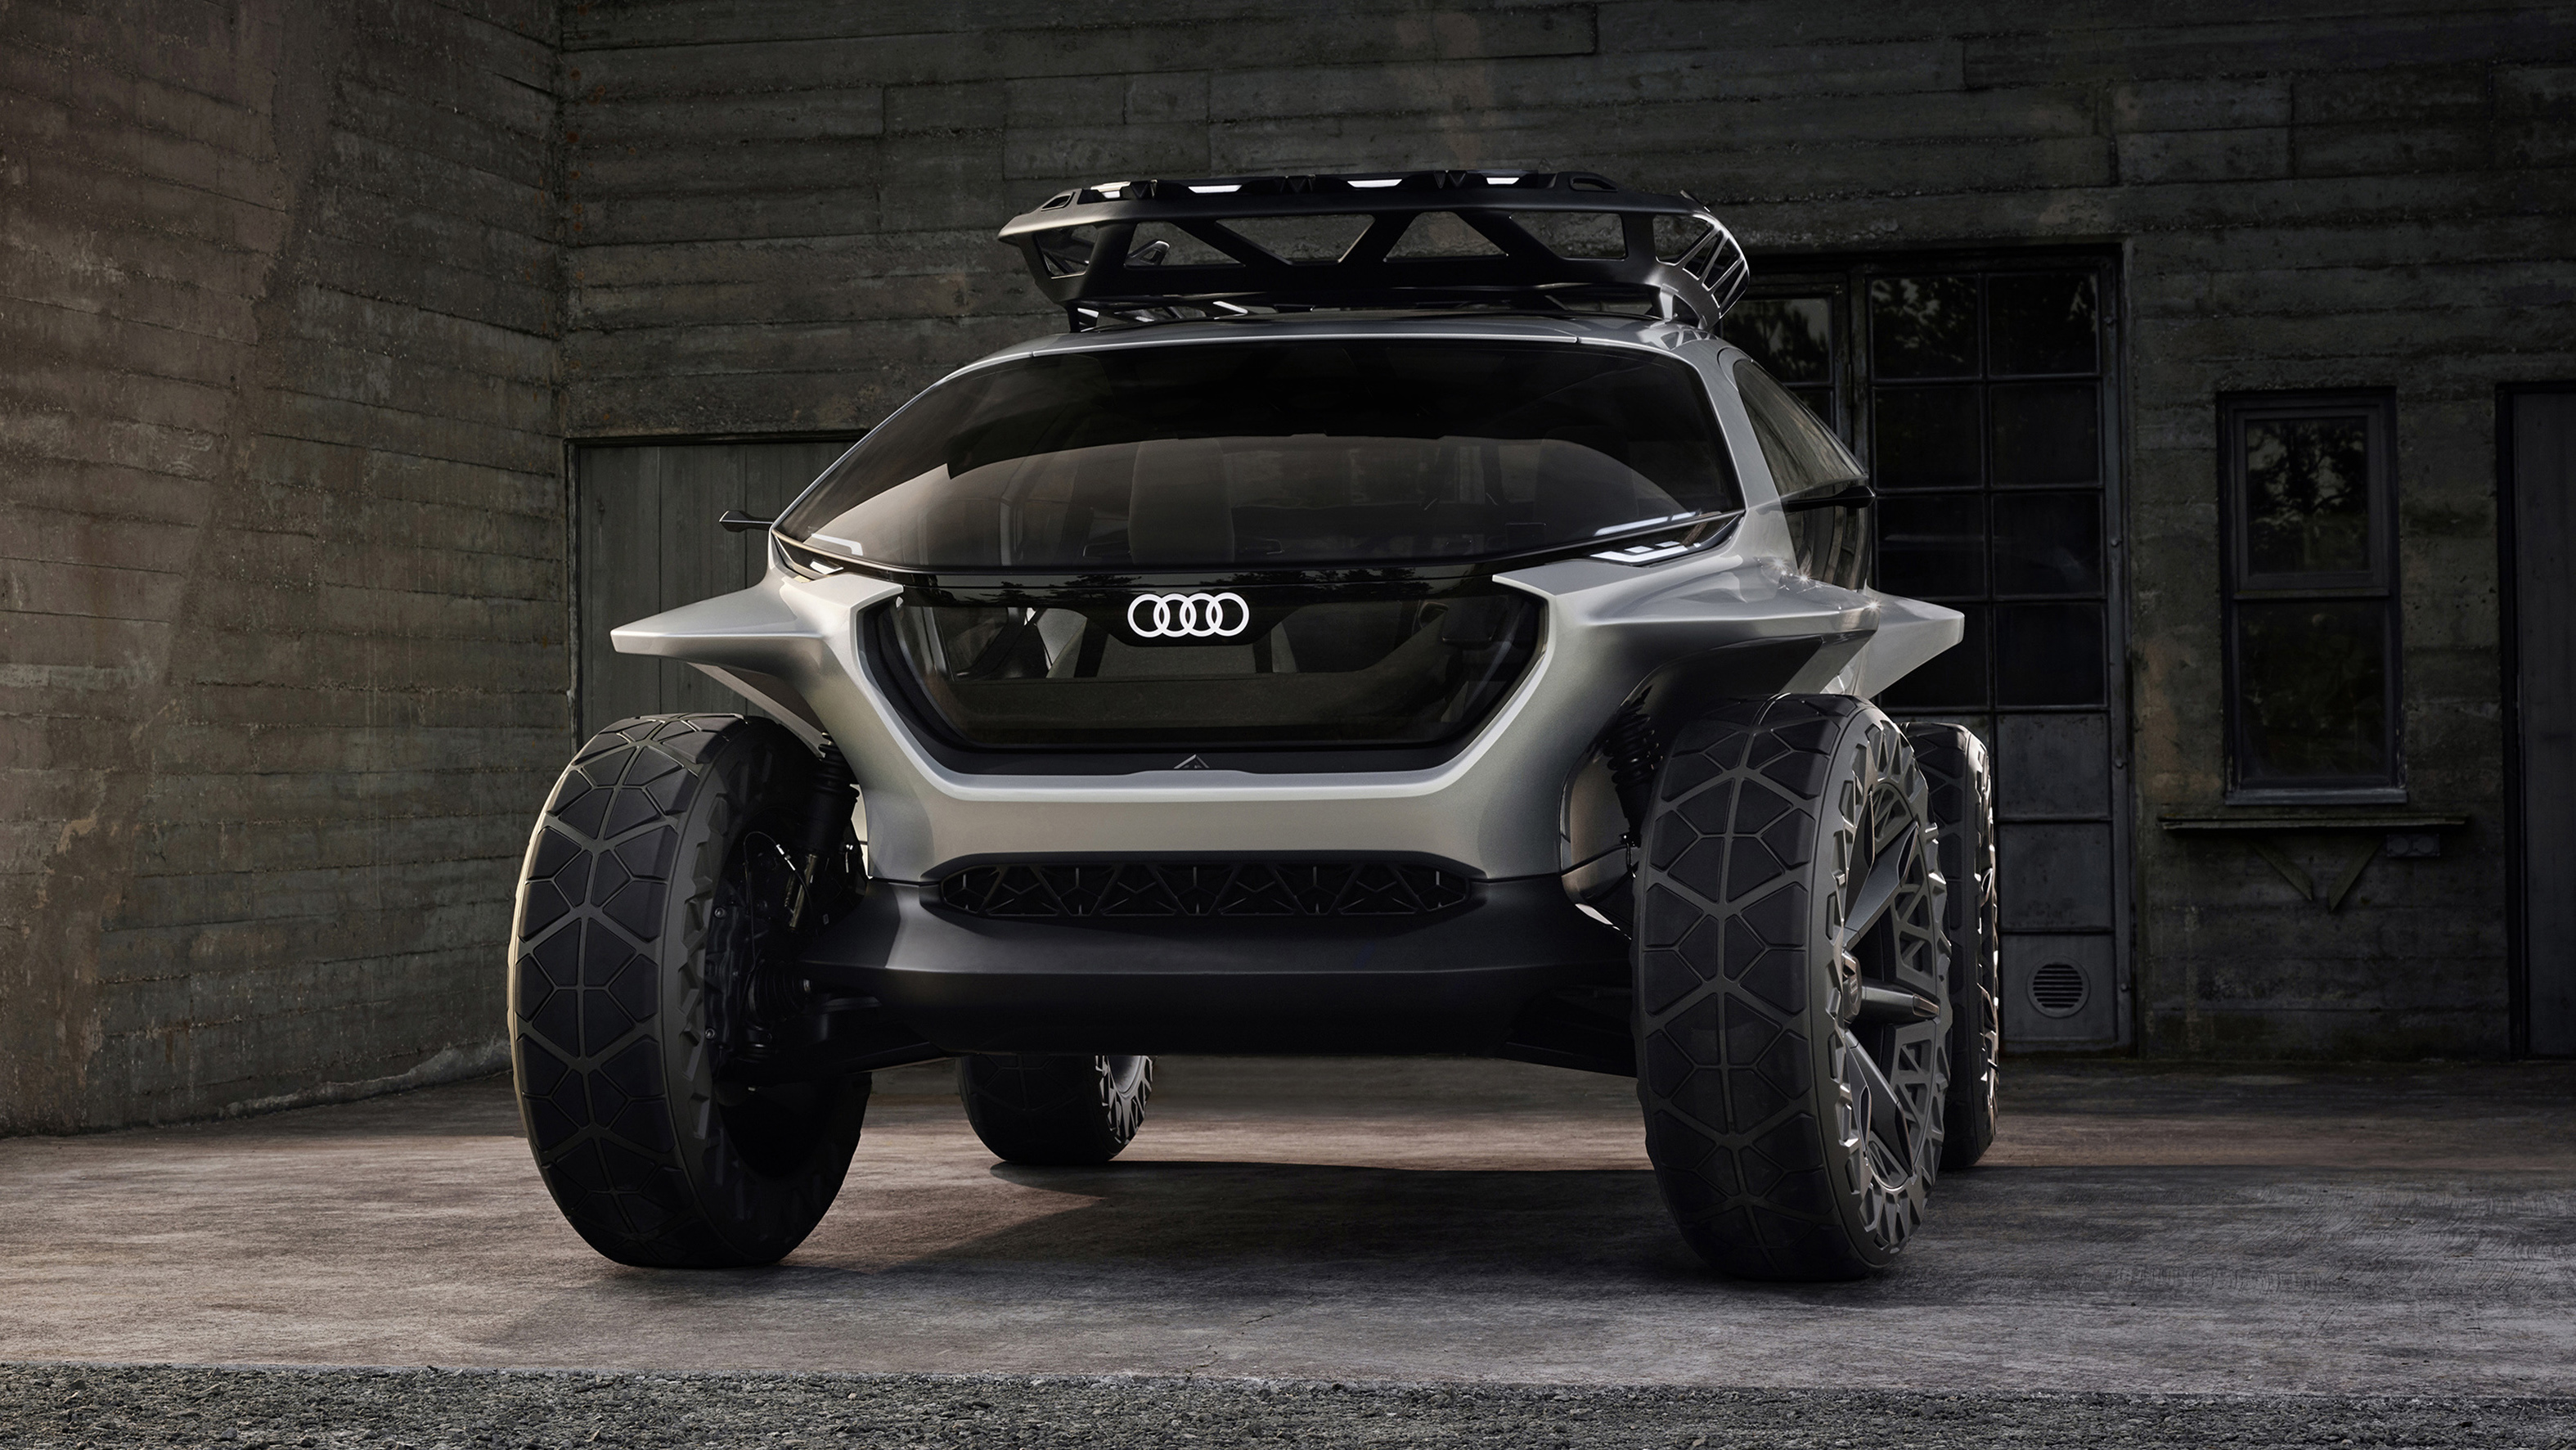 Audi Certified Pre Owned >> Audi AI:Trail Quattro off-road EV concept is wild | Autoblog